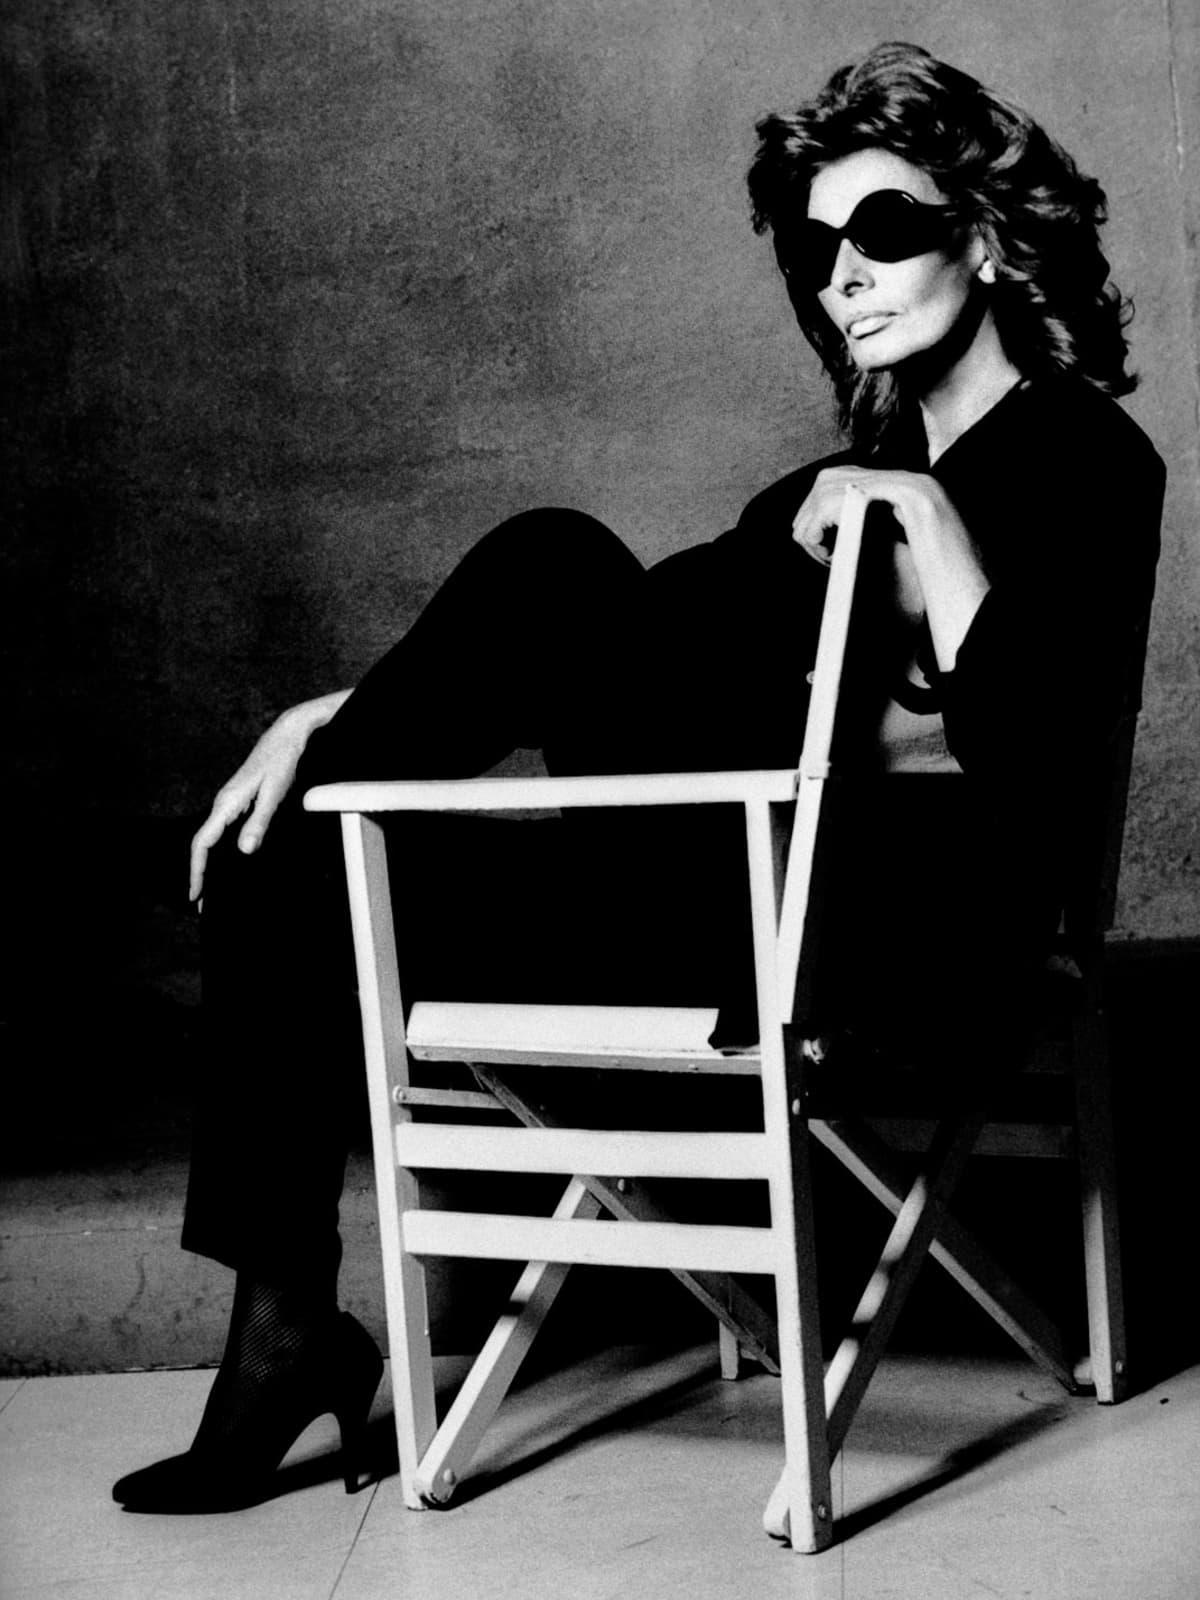 News_Greg Gorman_Sophia Loren